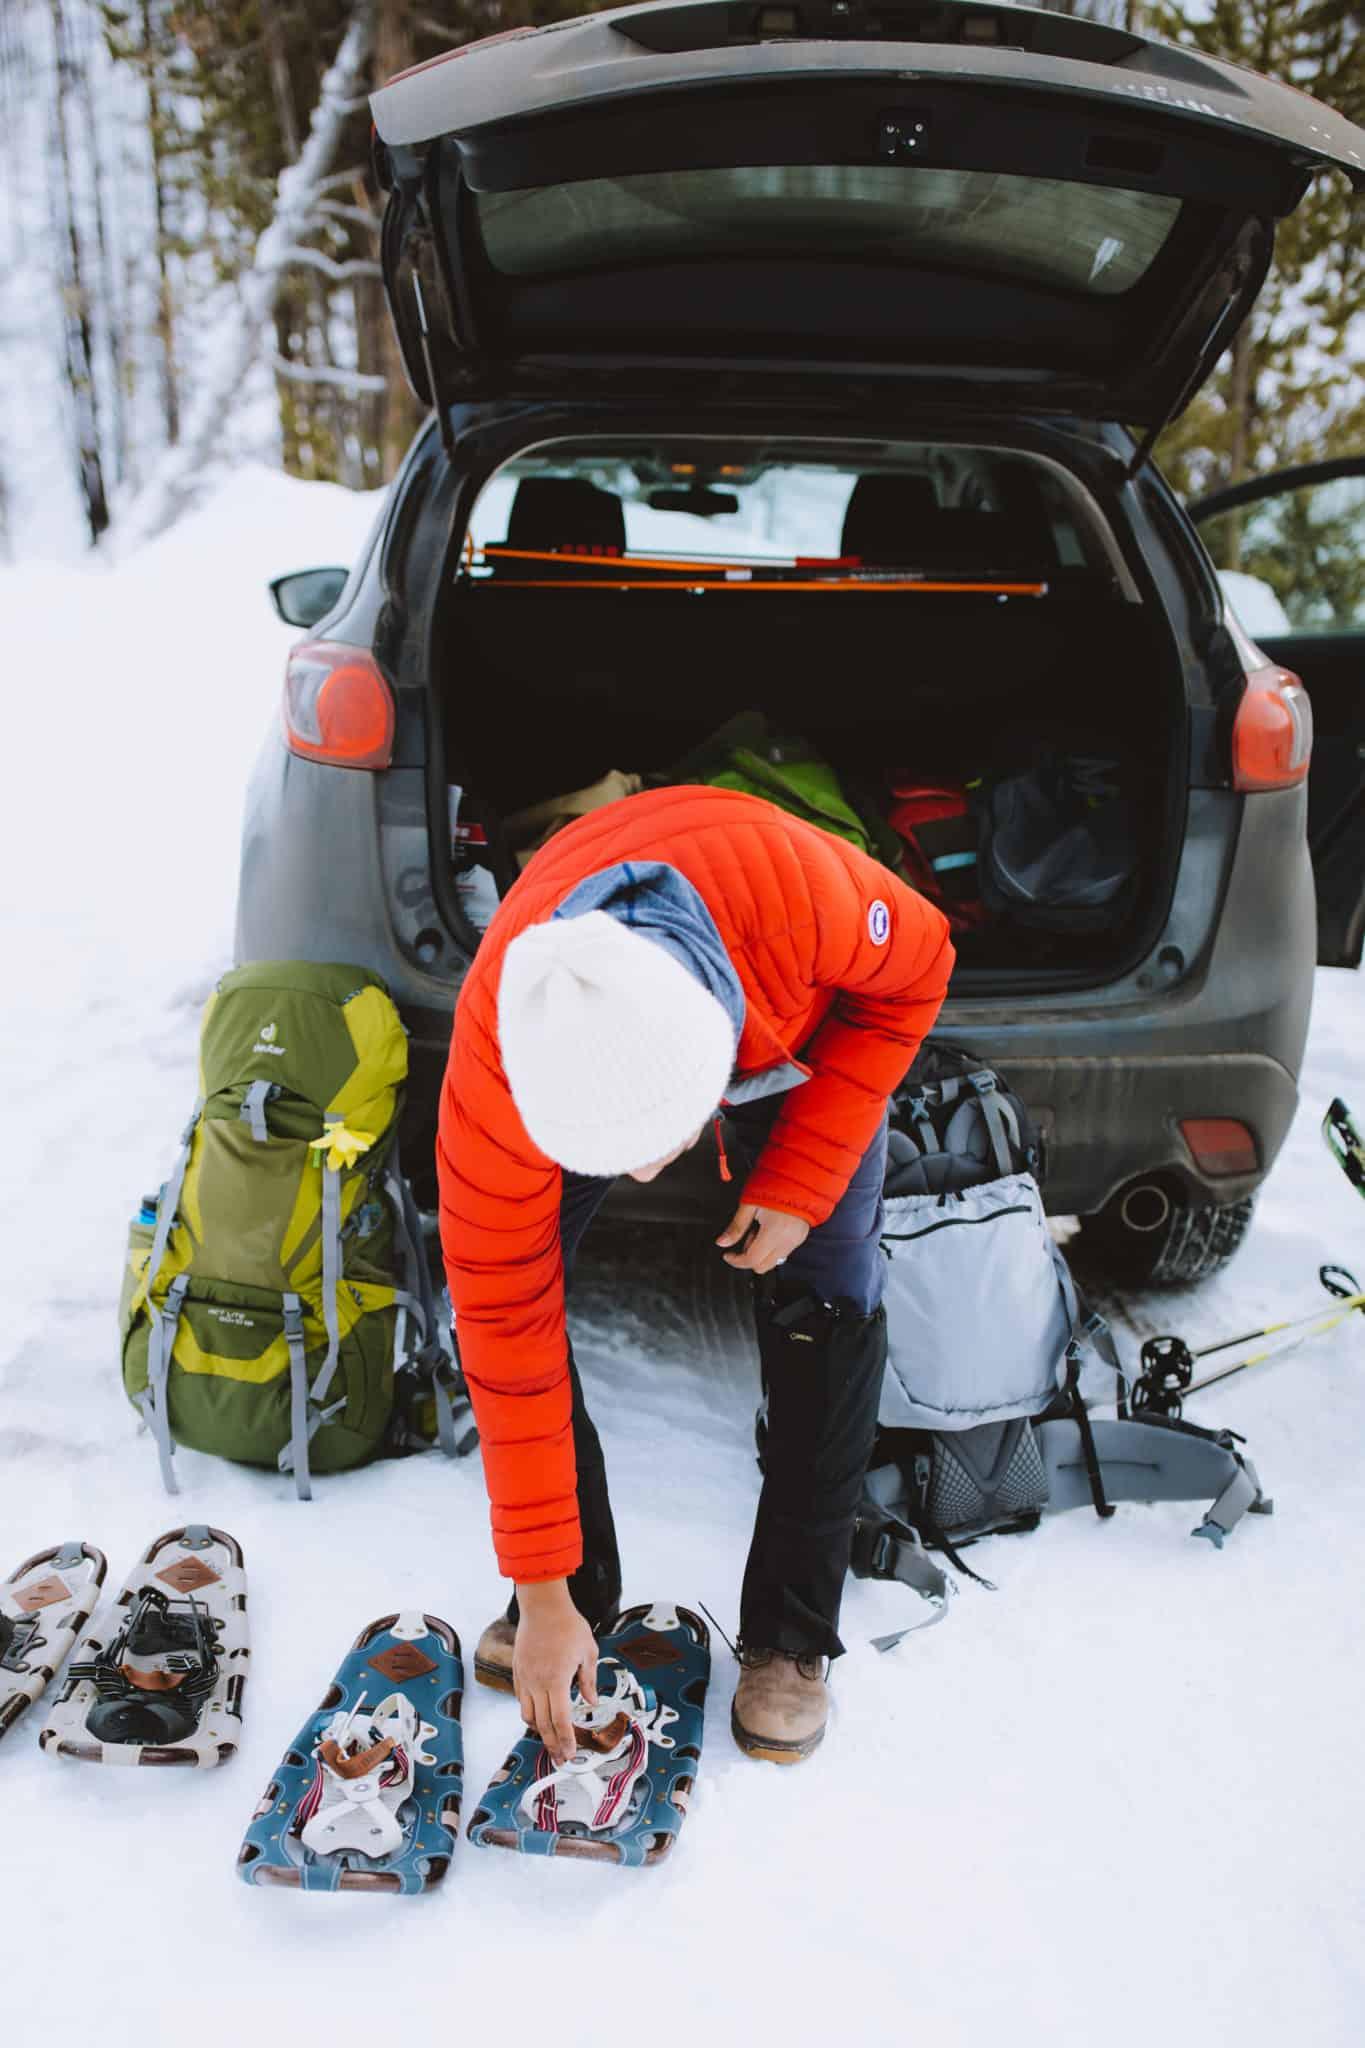 Berty Mandagie preparing snowshoes for Idaho city snowshoe trails